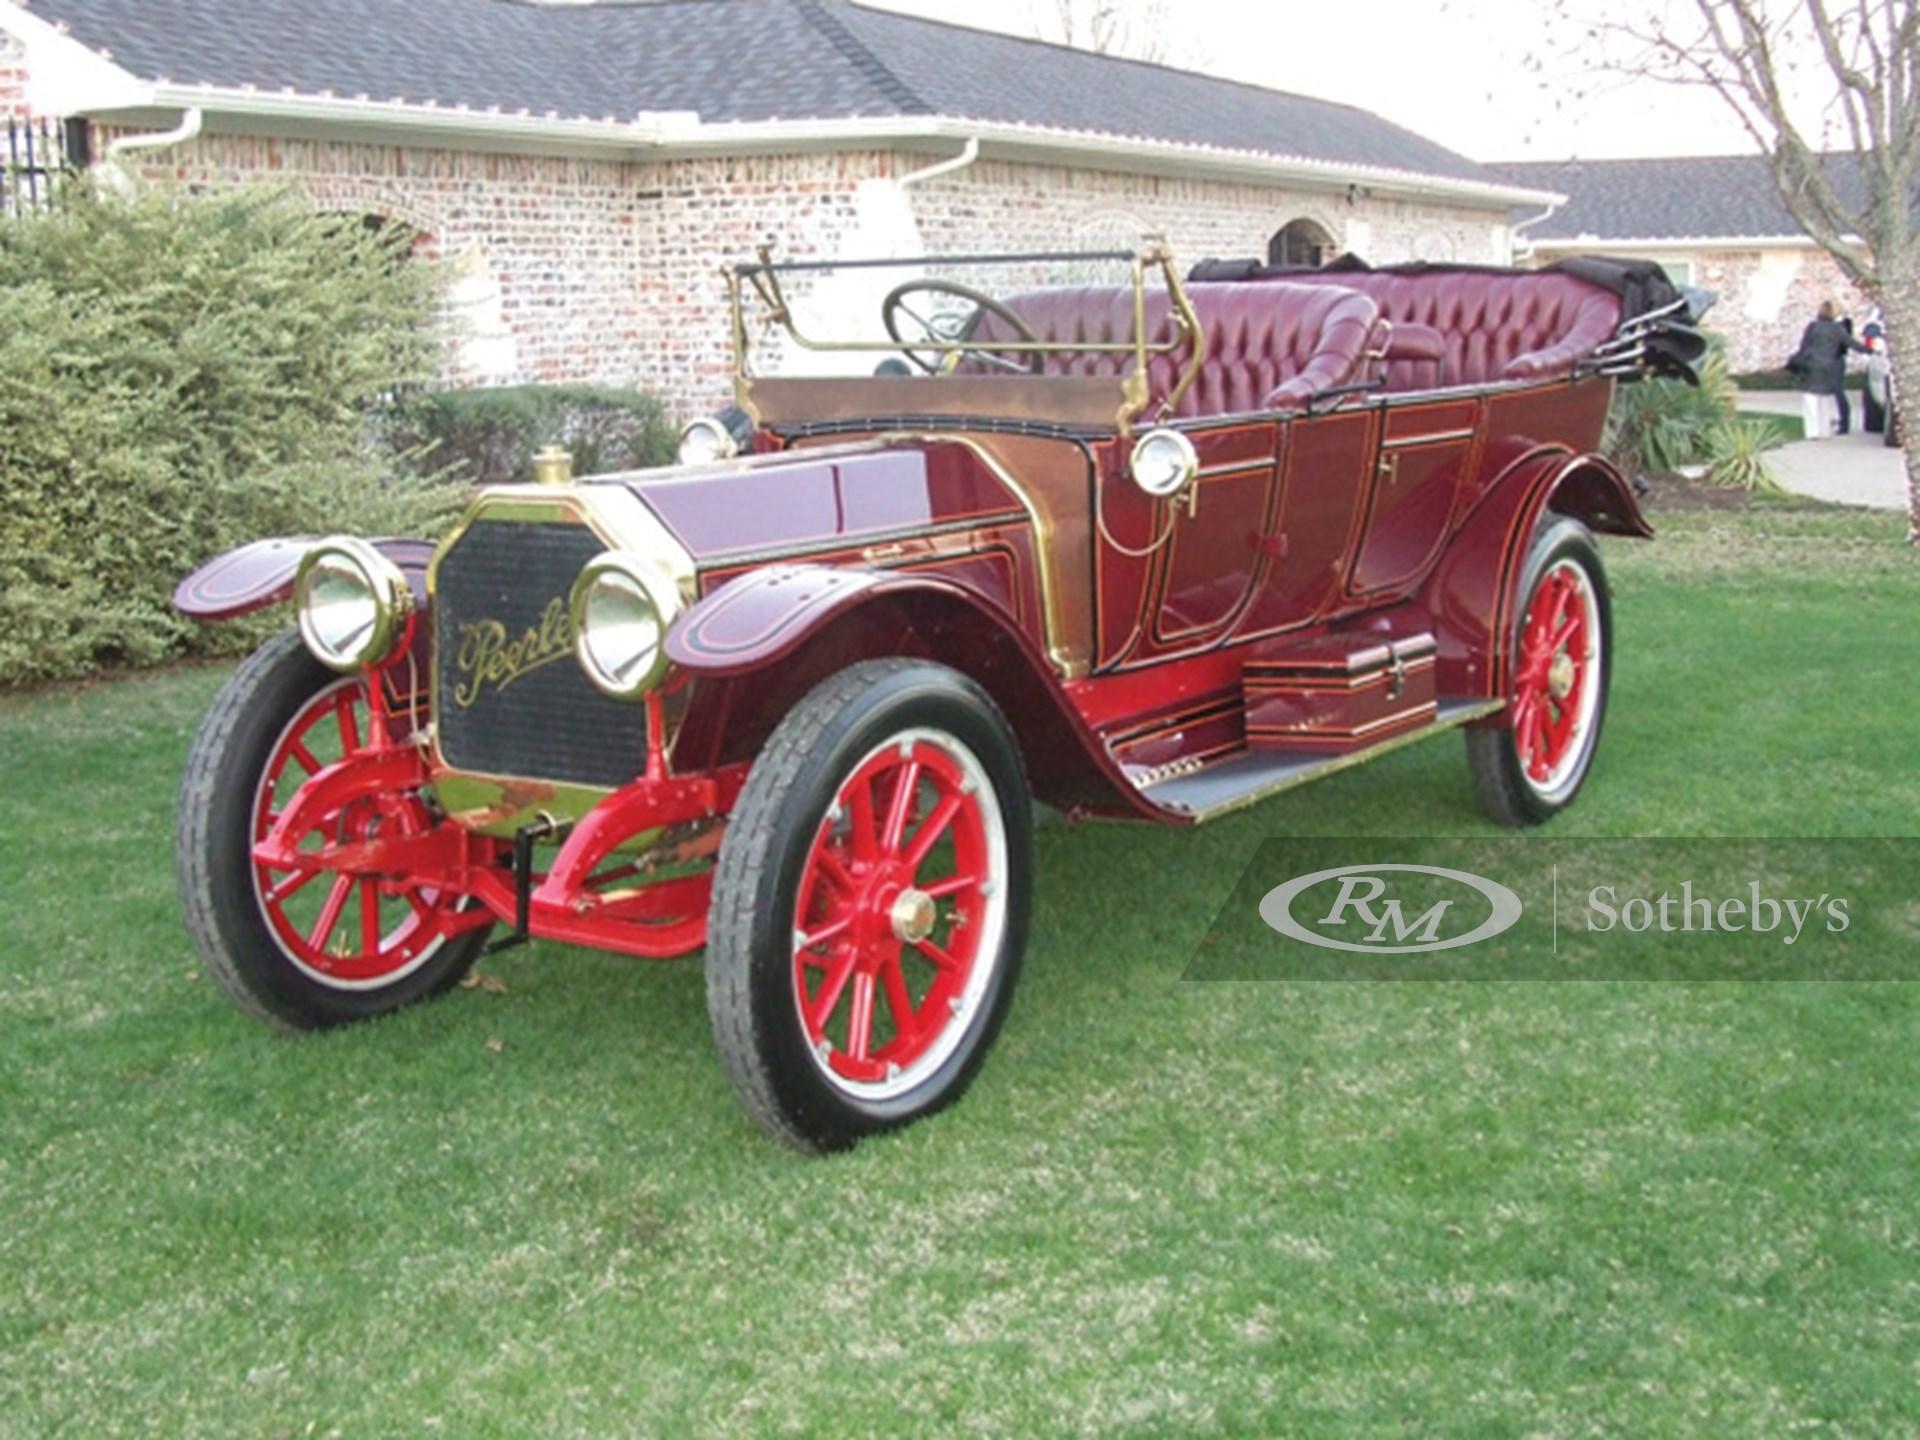 1912 Peerless Model 36 7-Passenger Touring Car